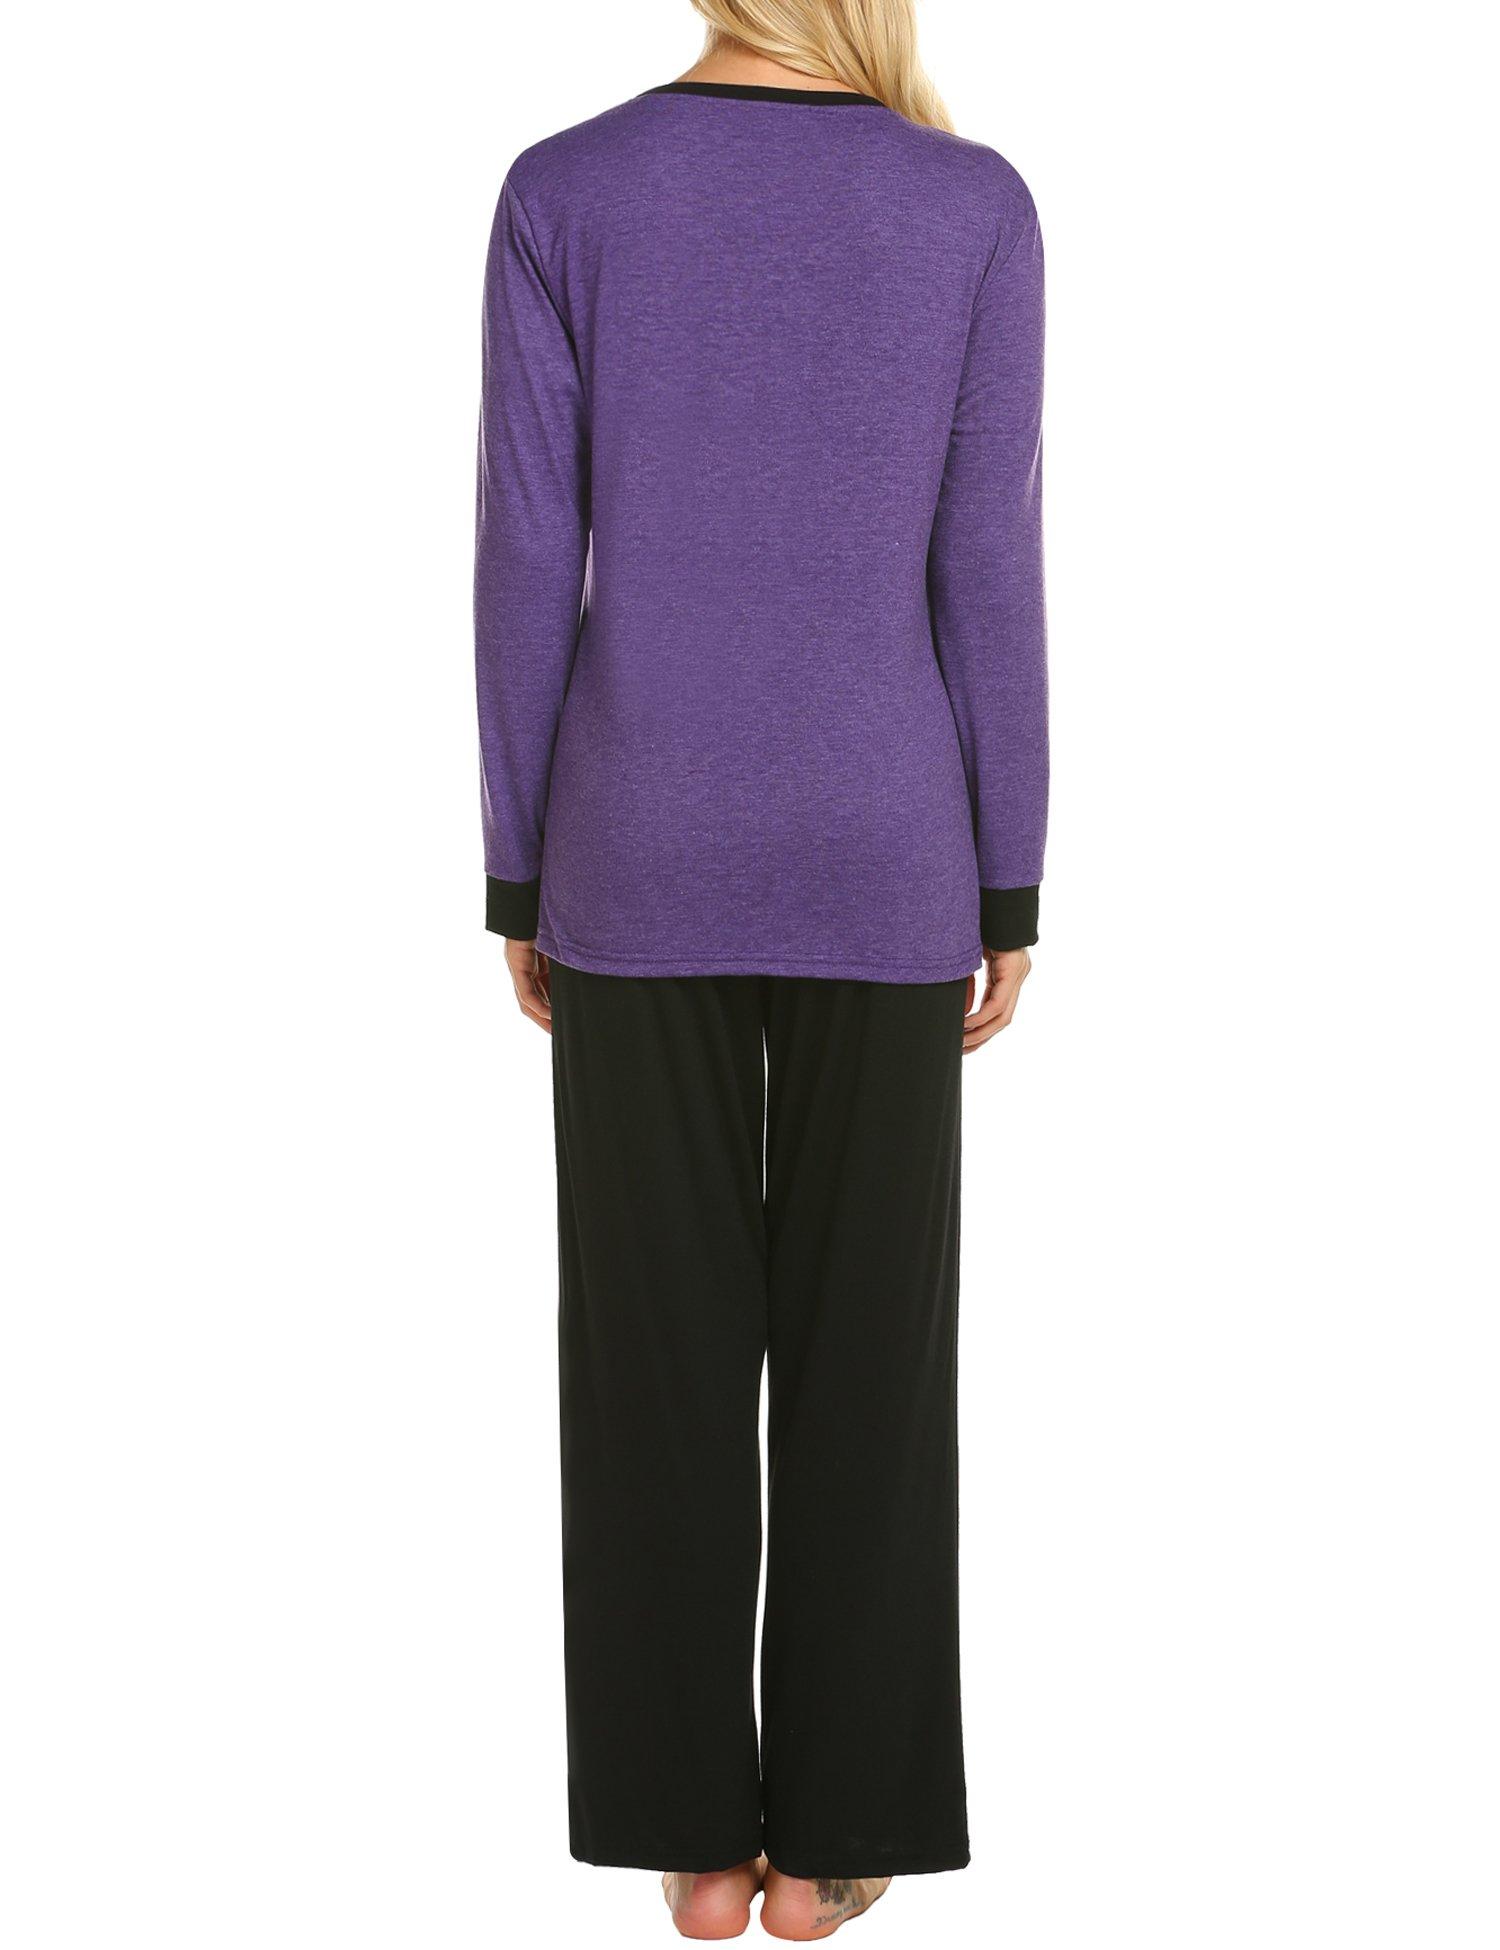 MAXMODA Soft Pajamas Long Sleeve Sleepwear Soft PJ Set with Pants Purple L by MAXMODA (Image #2)